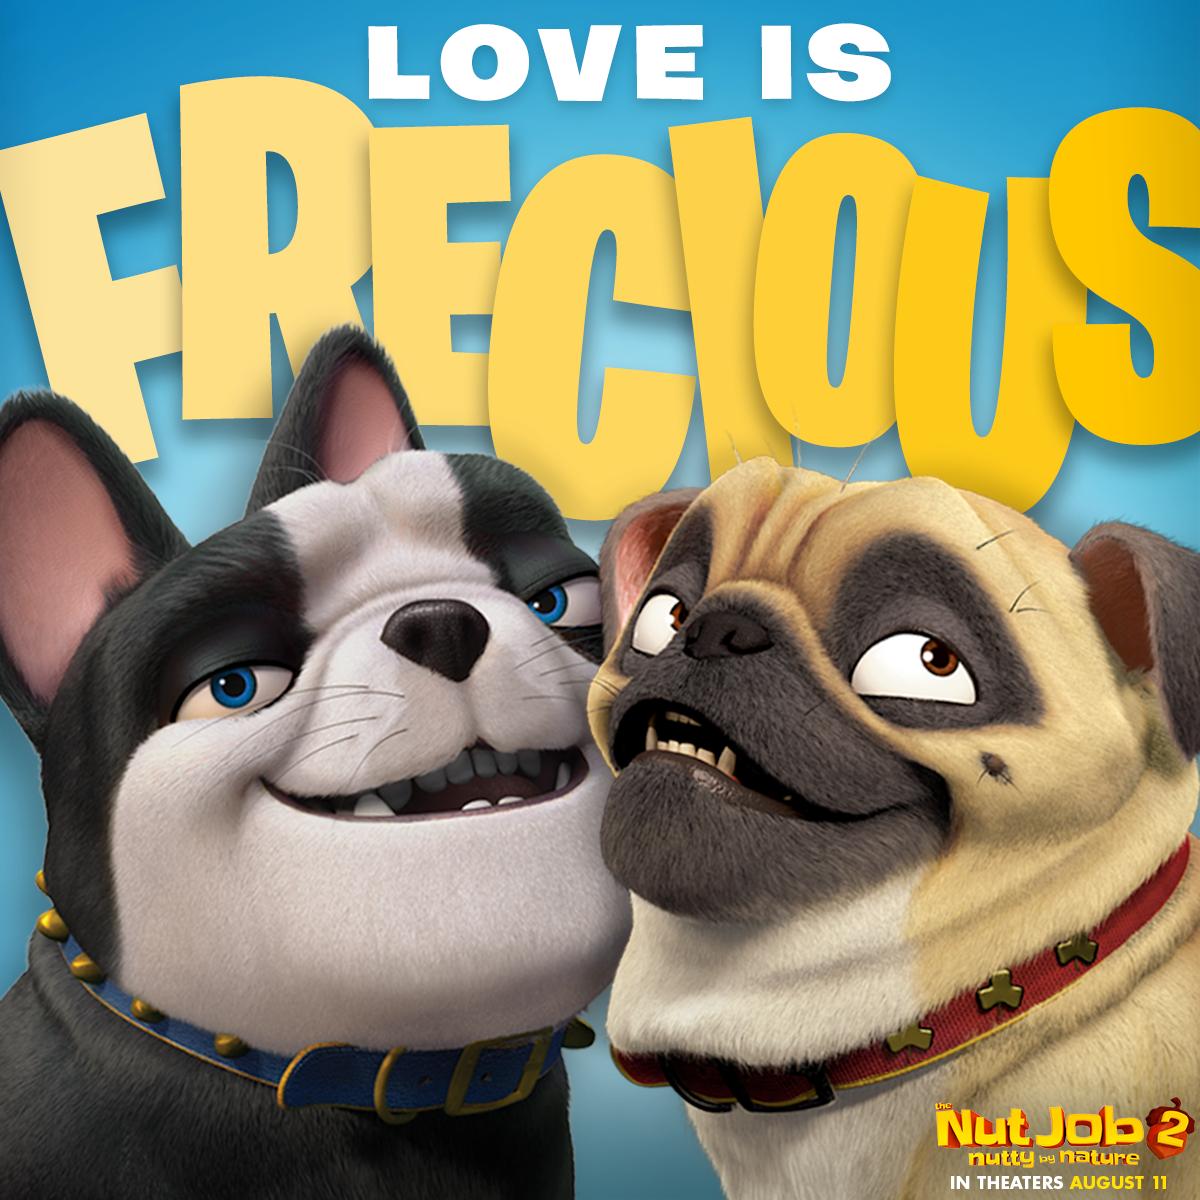 Frankie Precious Best Friends Tag Your Best Friend To Celebrate Nationalbestfriendsday Thenutjob2 The Nut Job Animal Groups Animals Friends